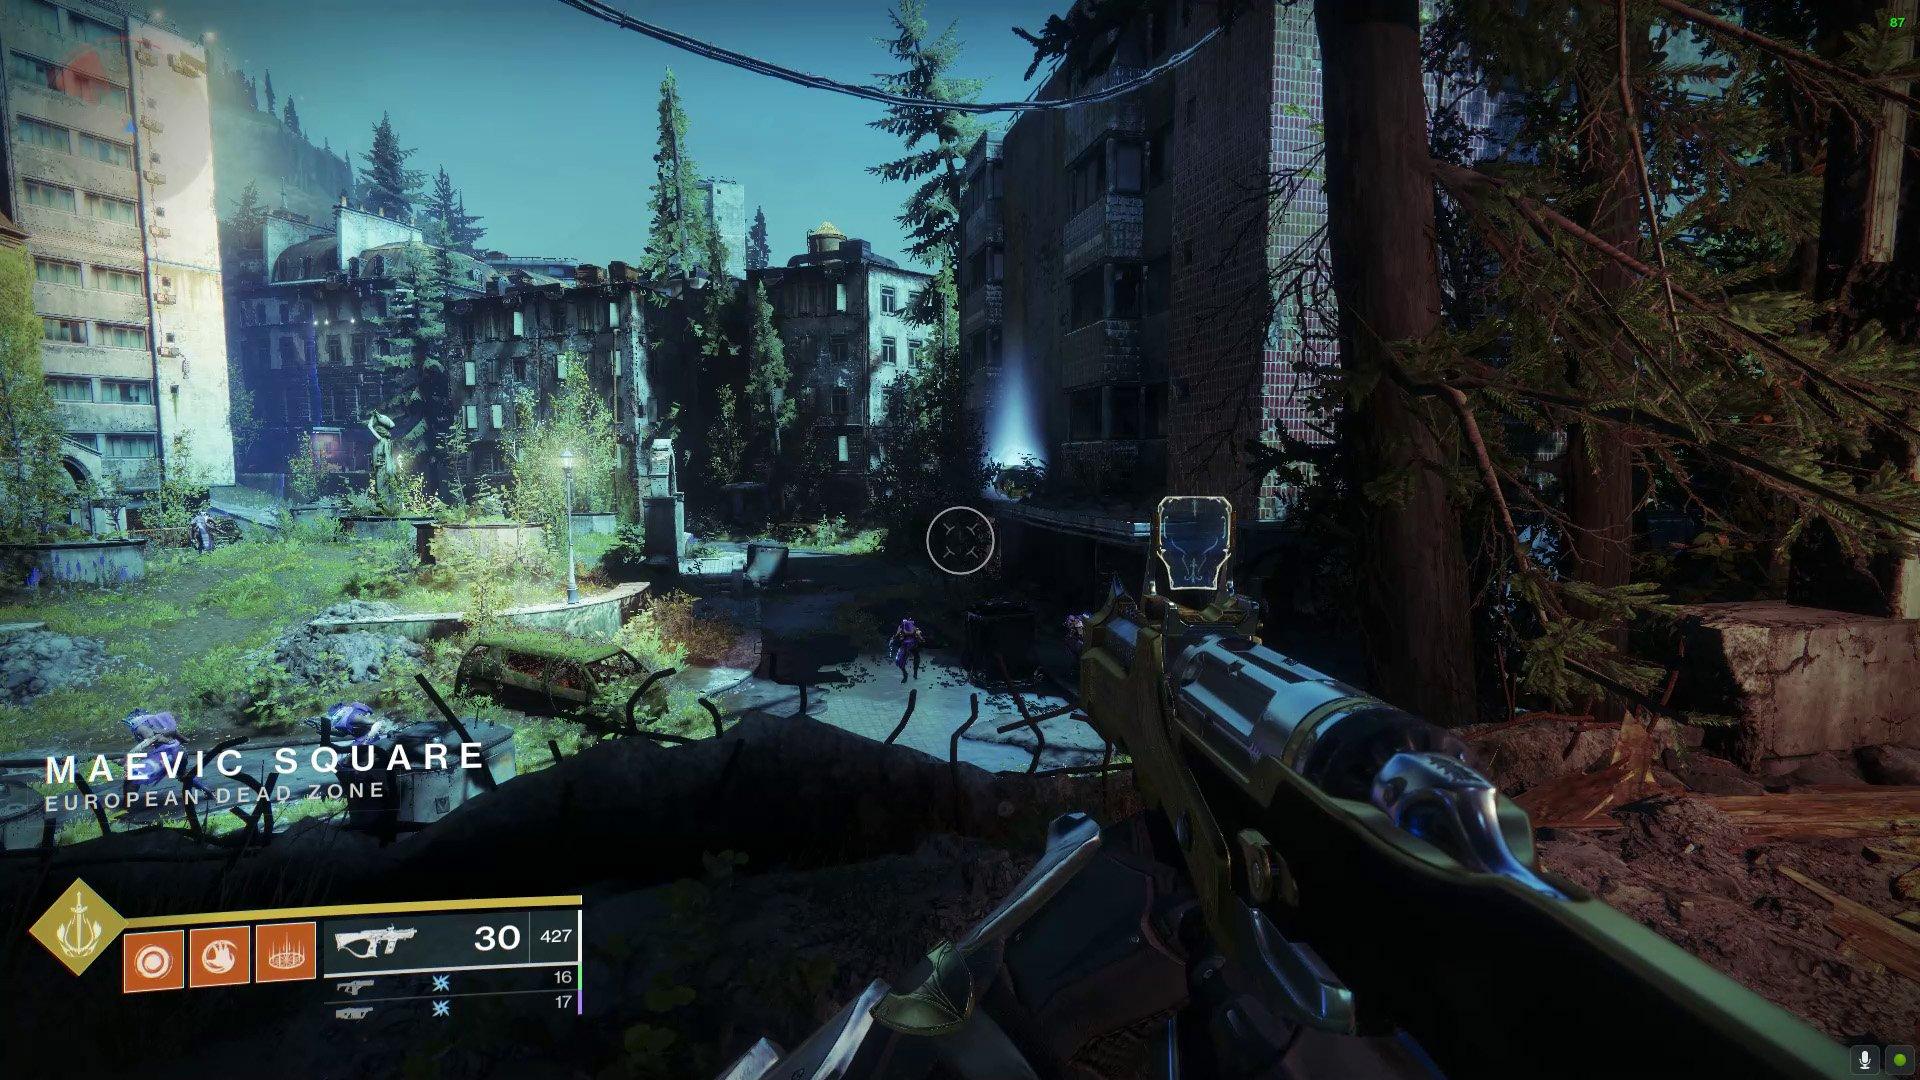 Destiny 2 Maevic Square Imperial treasure